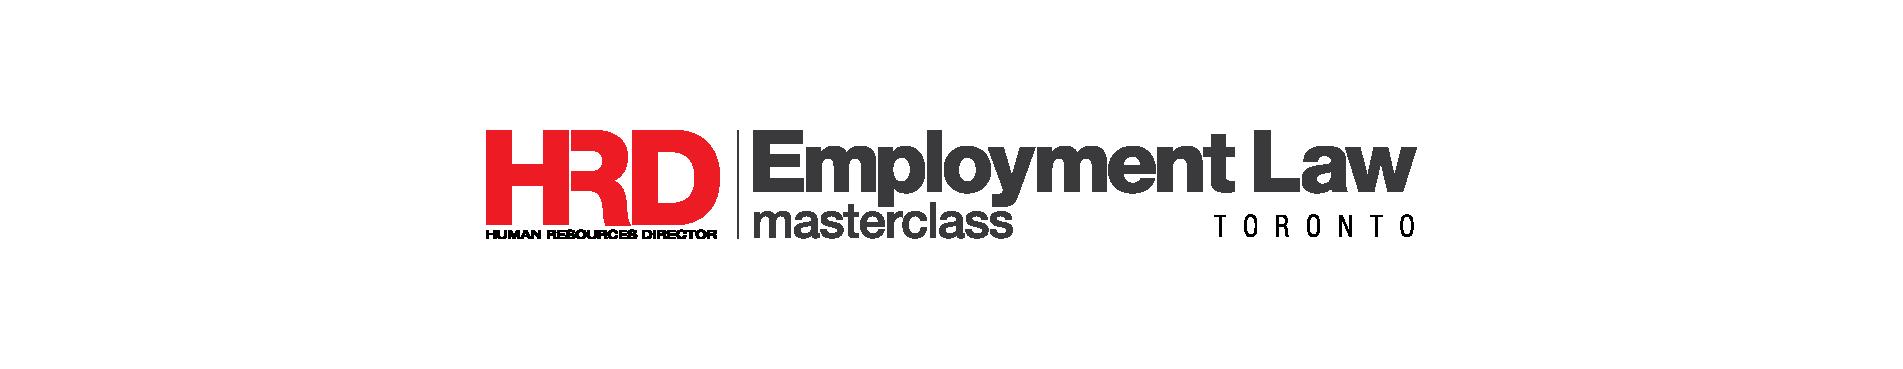 Employment Law Masterclass Toronto